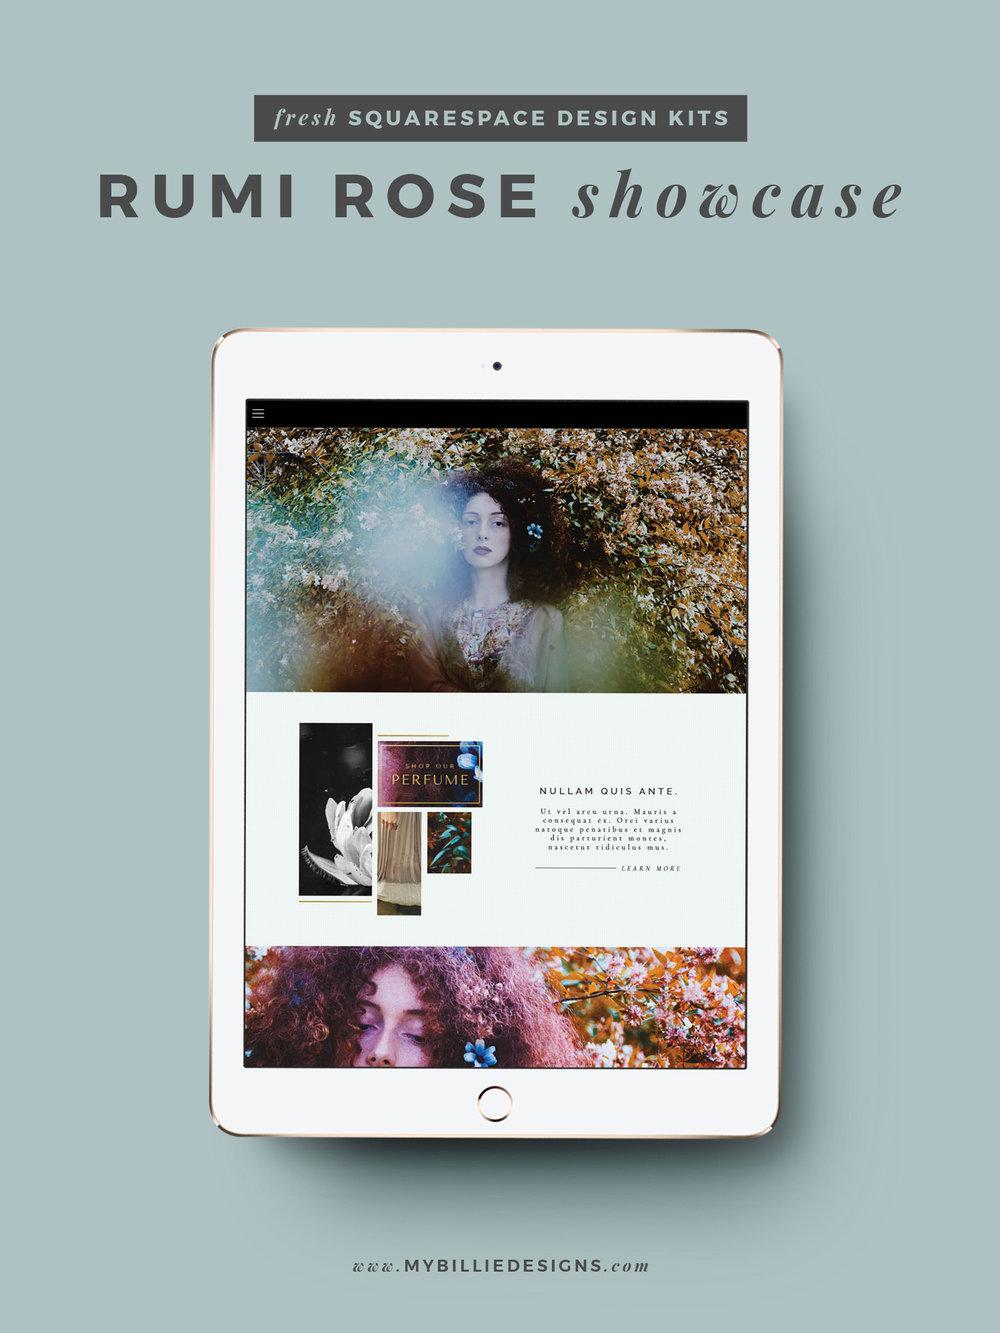 MBD Squarespace Design Kits | Rumi Rose Design + Customization Ideas